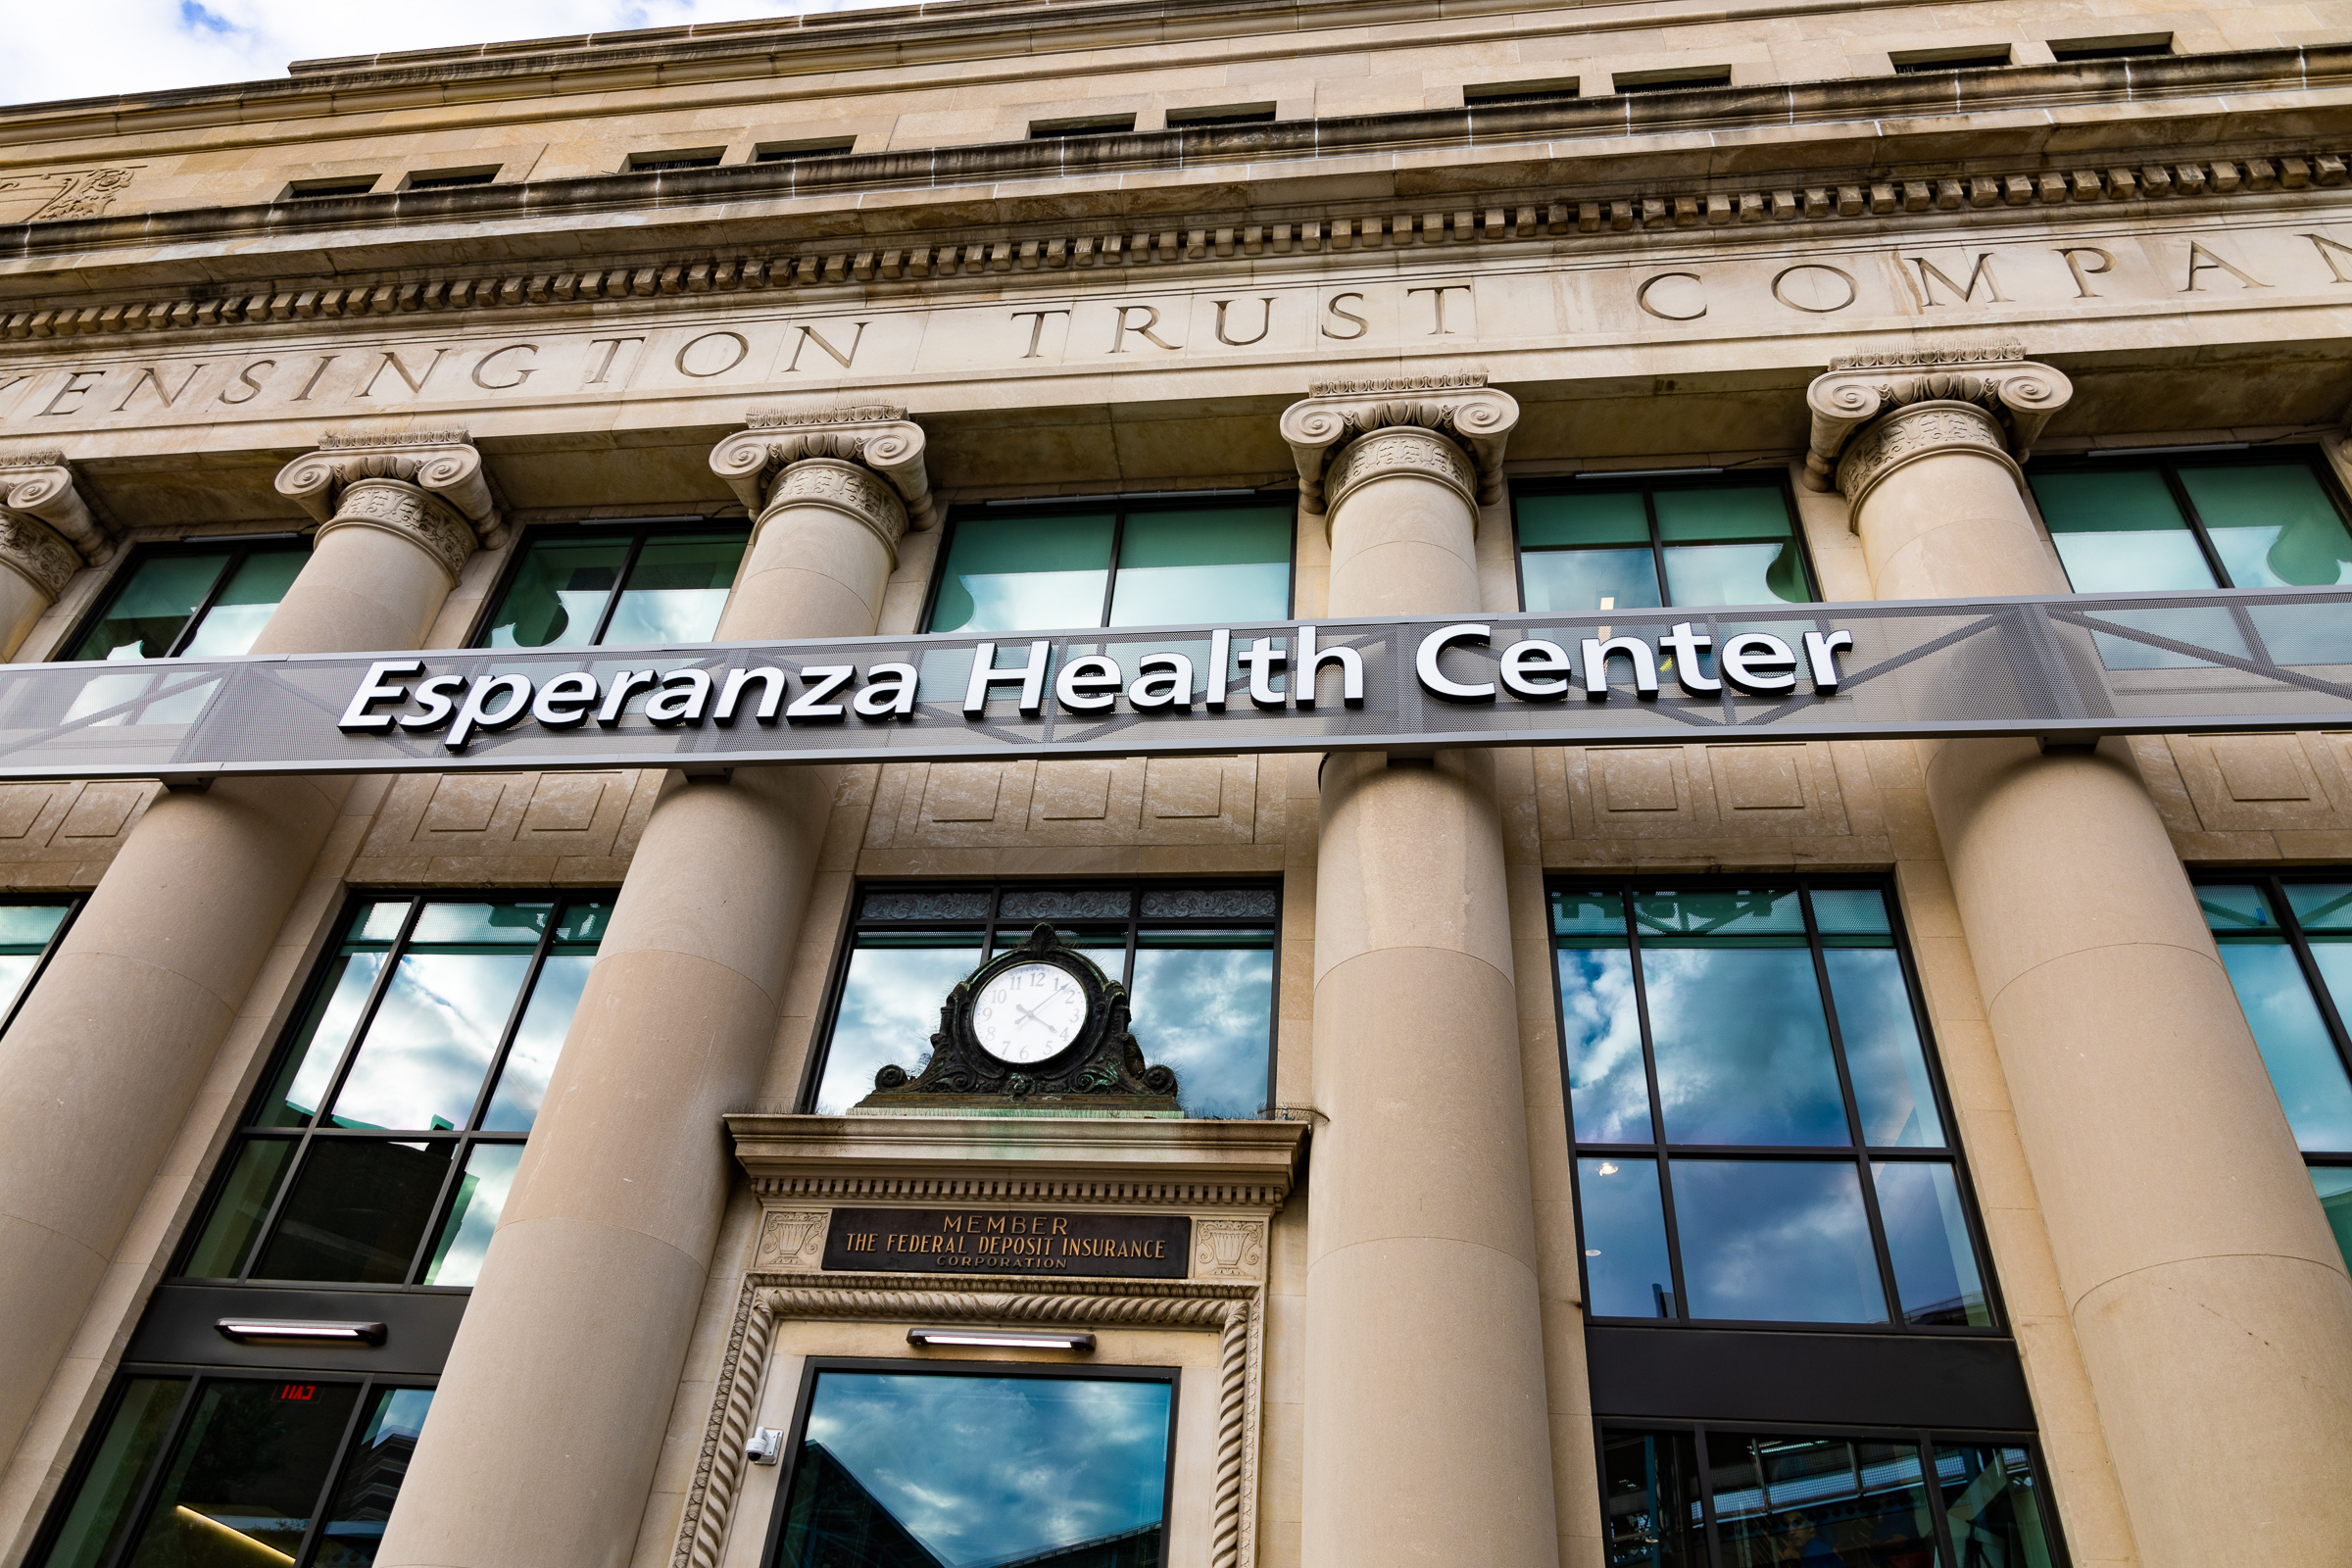 Esperanza Health Center North 6th Street Philadelphia Pa ...